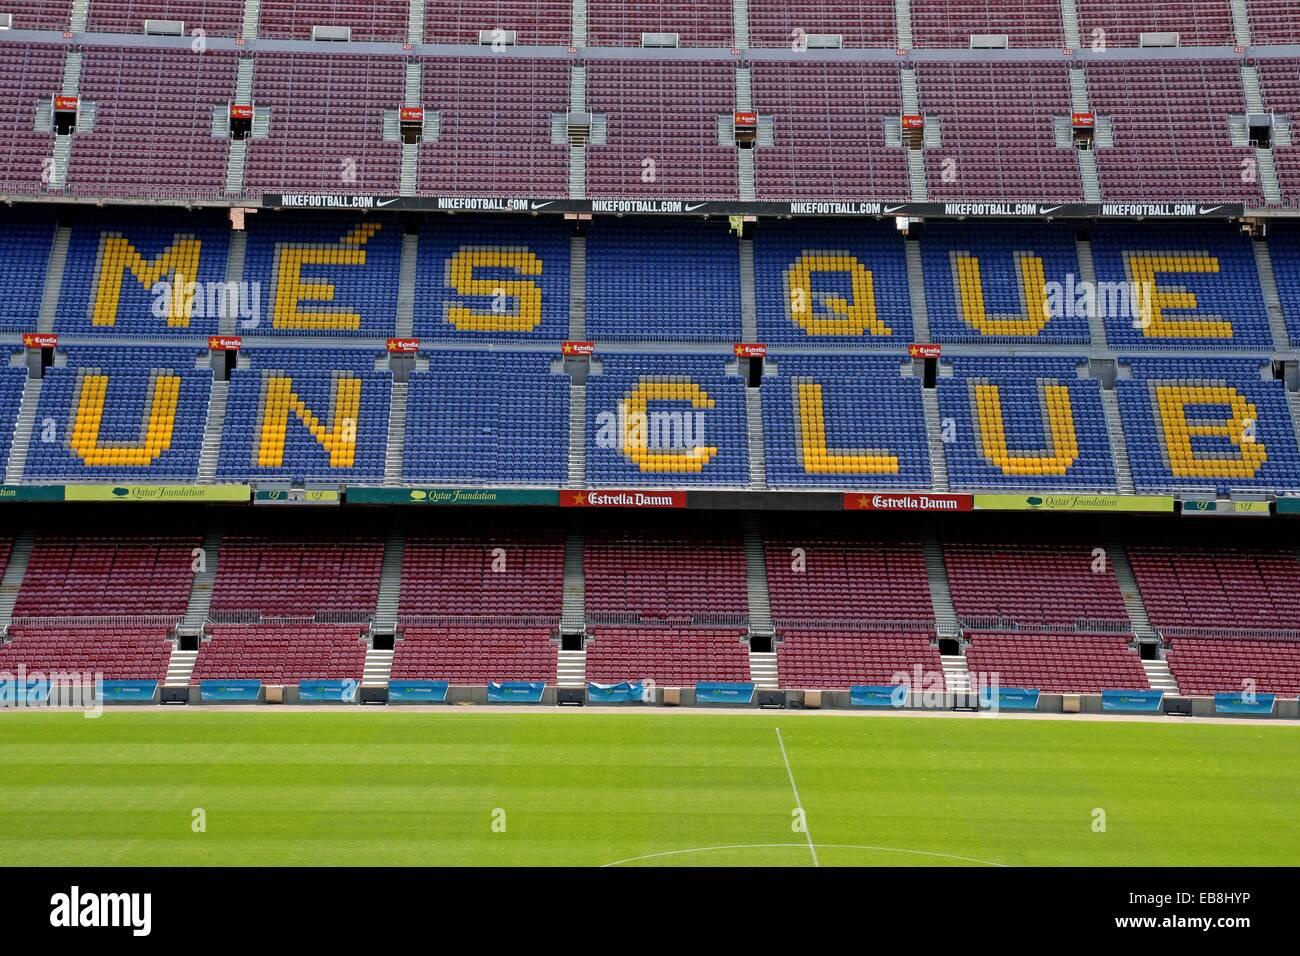 Harrows stadium, Camp Nou, FC Barcelona, Barcelona, Catalonia, Spain - Stock Image